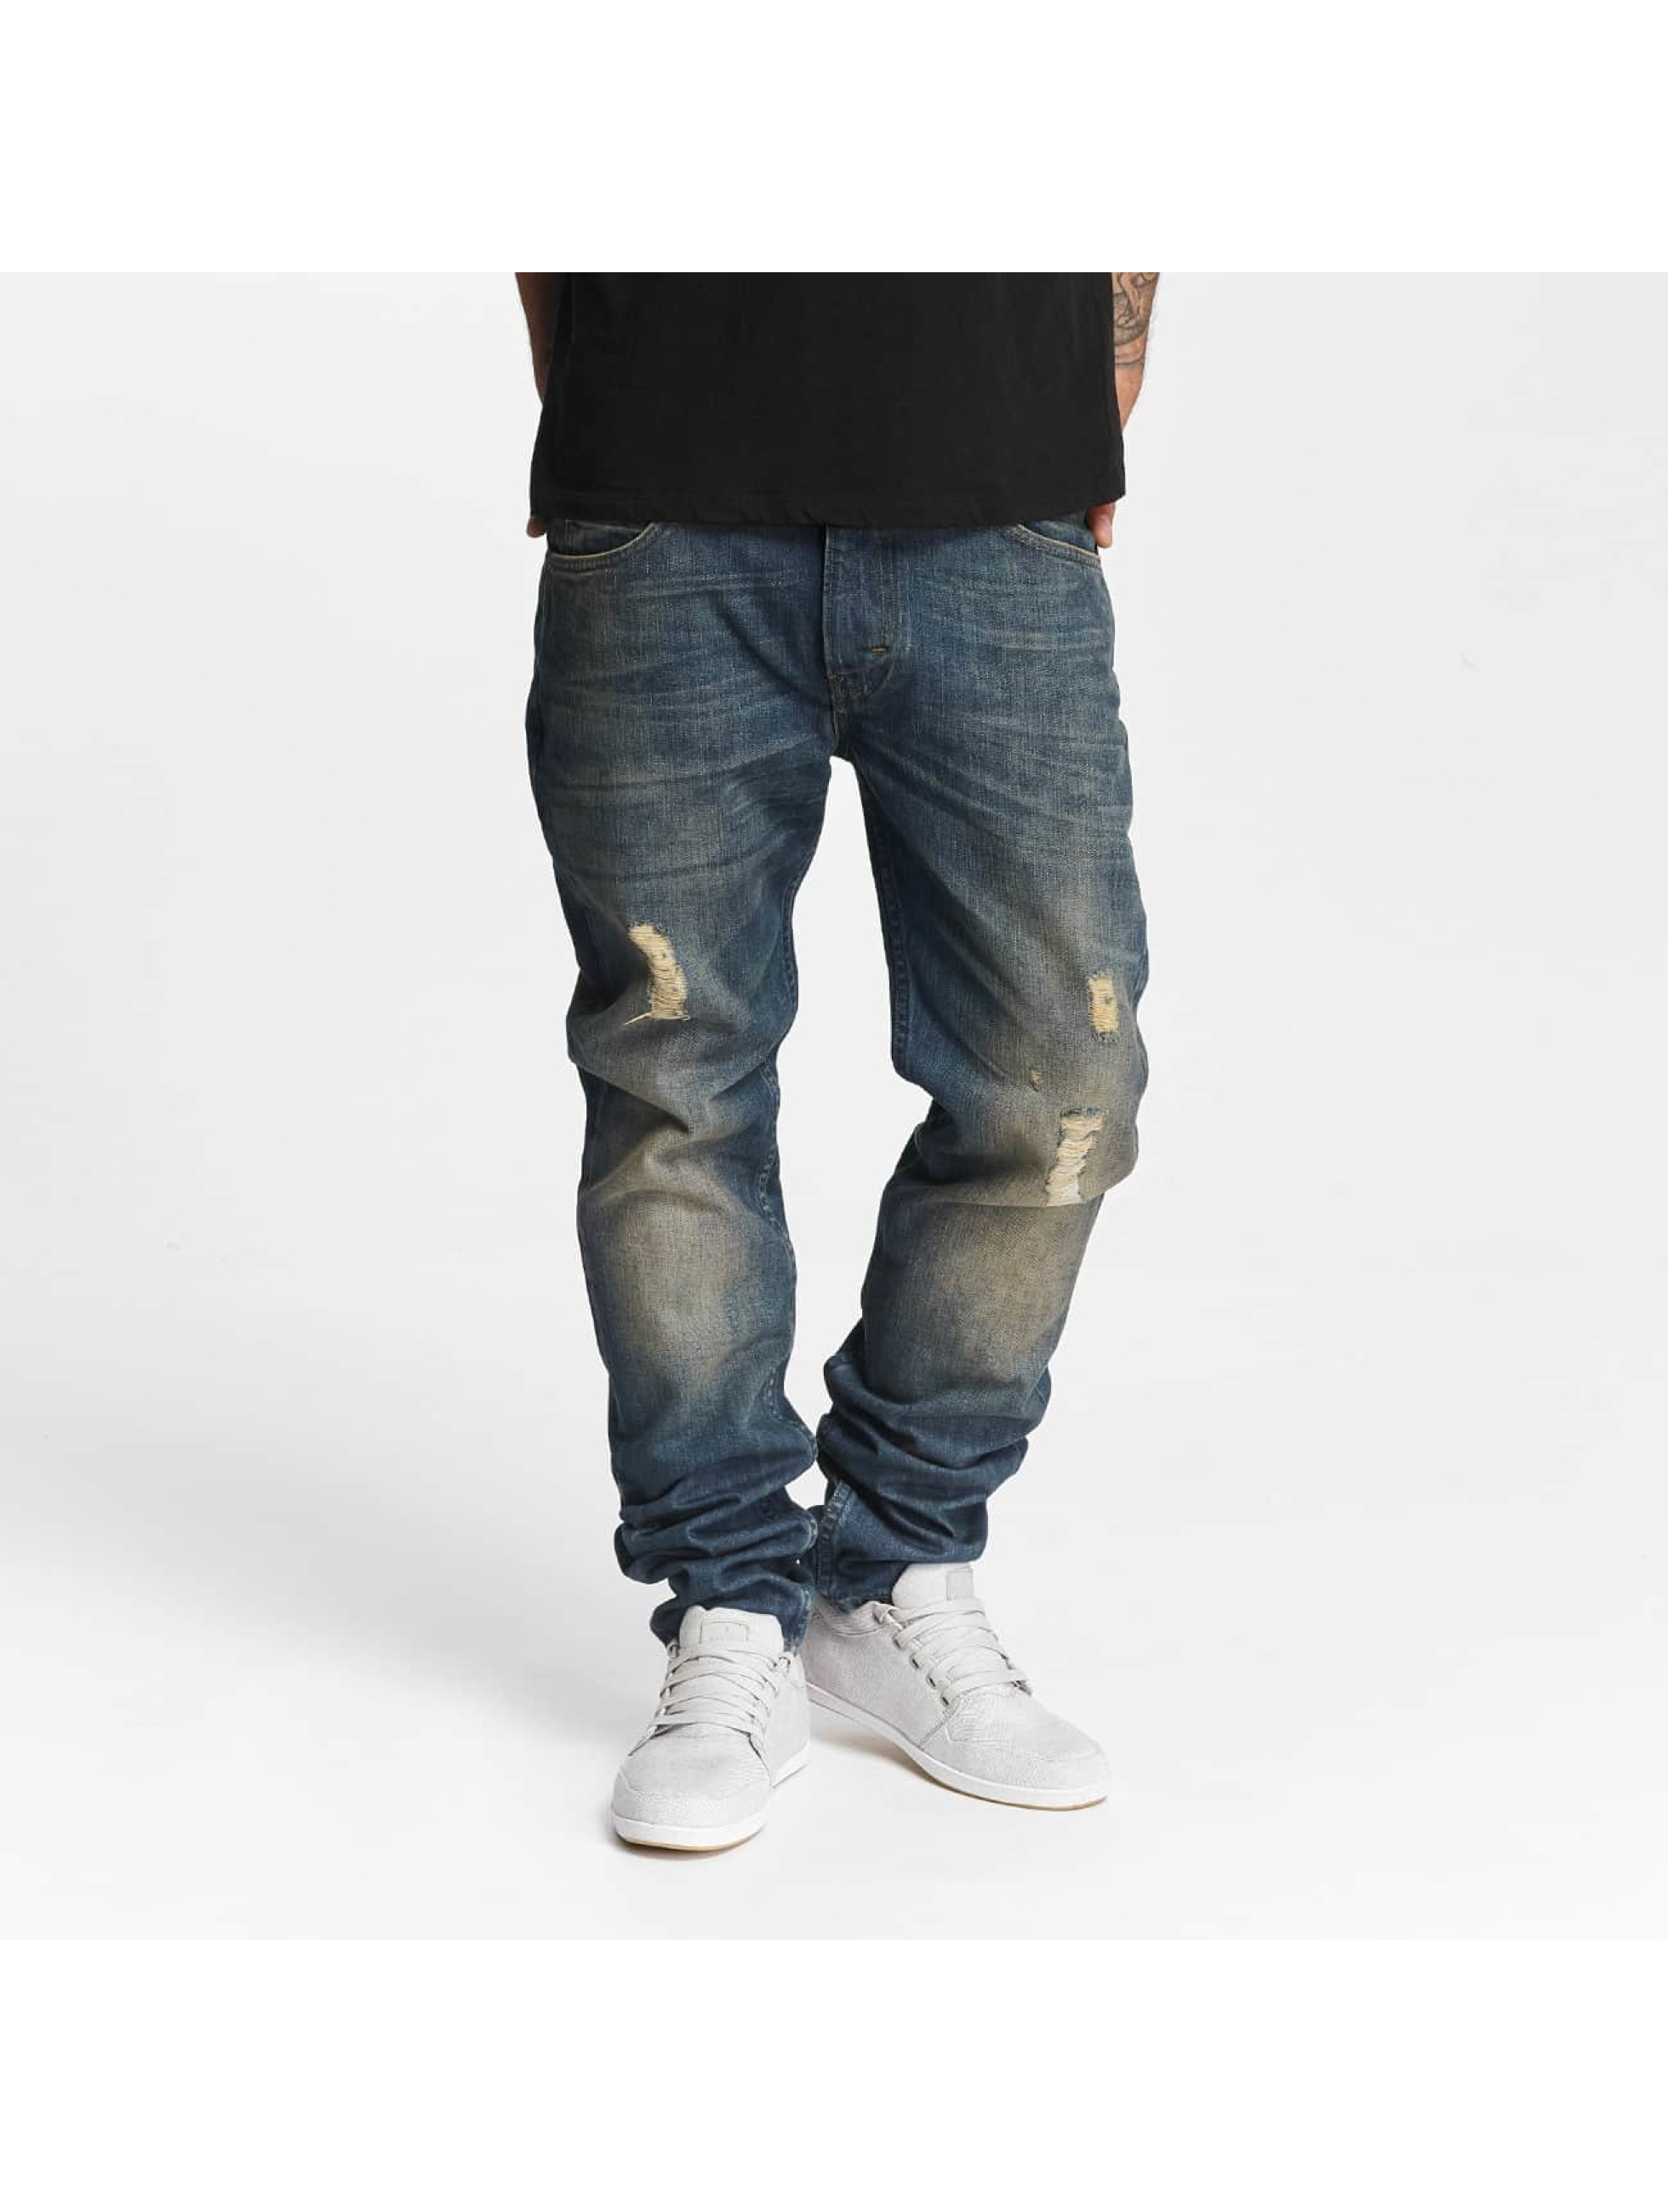 Lee Männer Slim Fit Jeans Rider Destroyed in blau